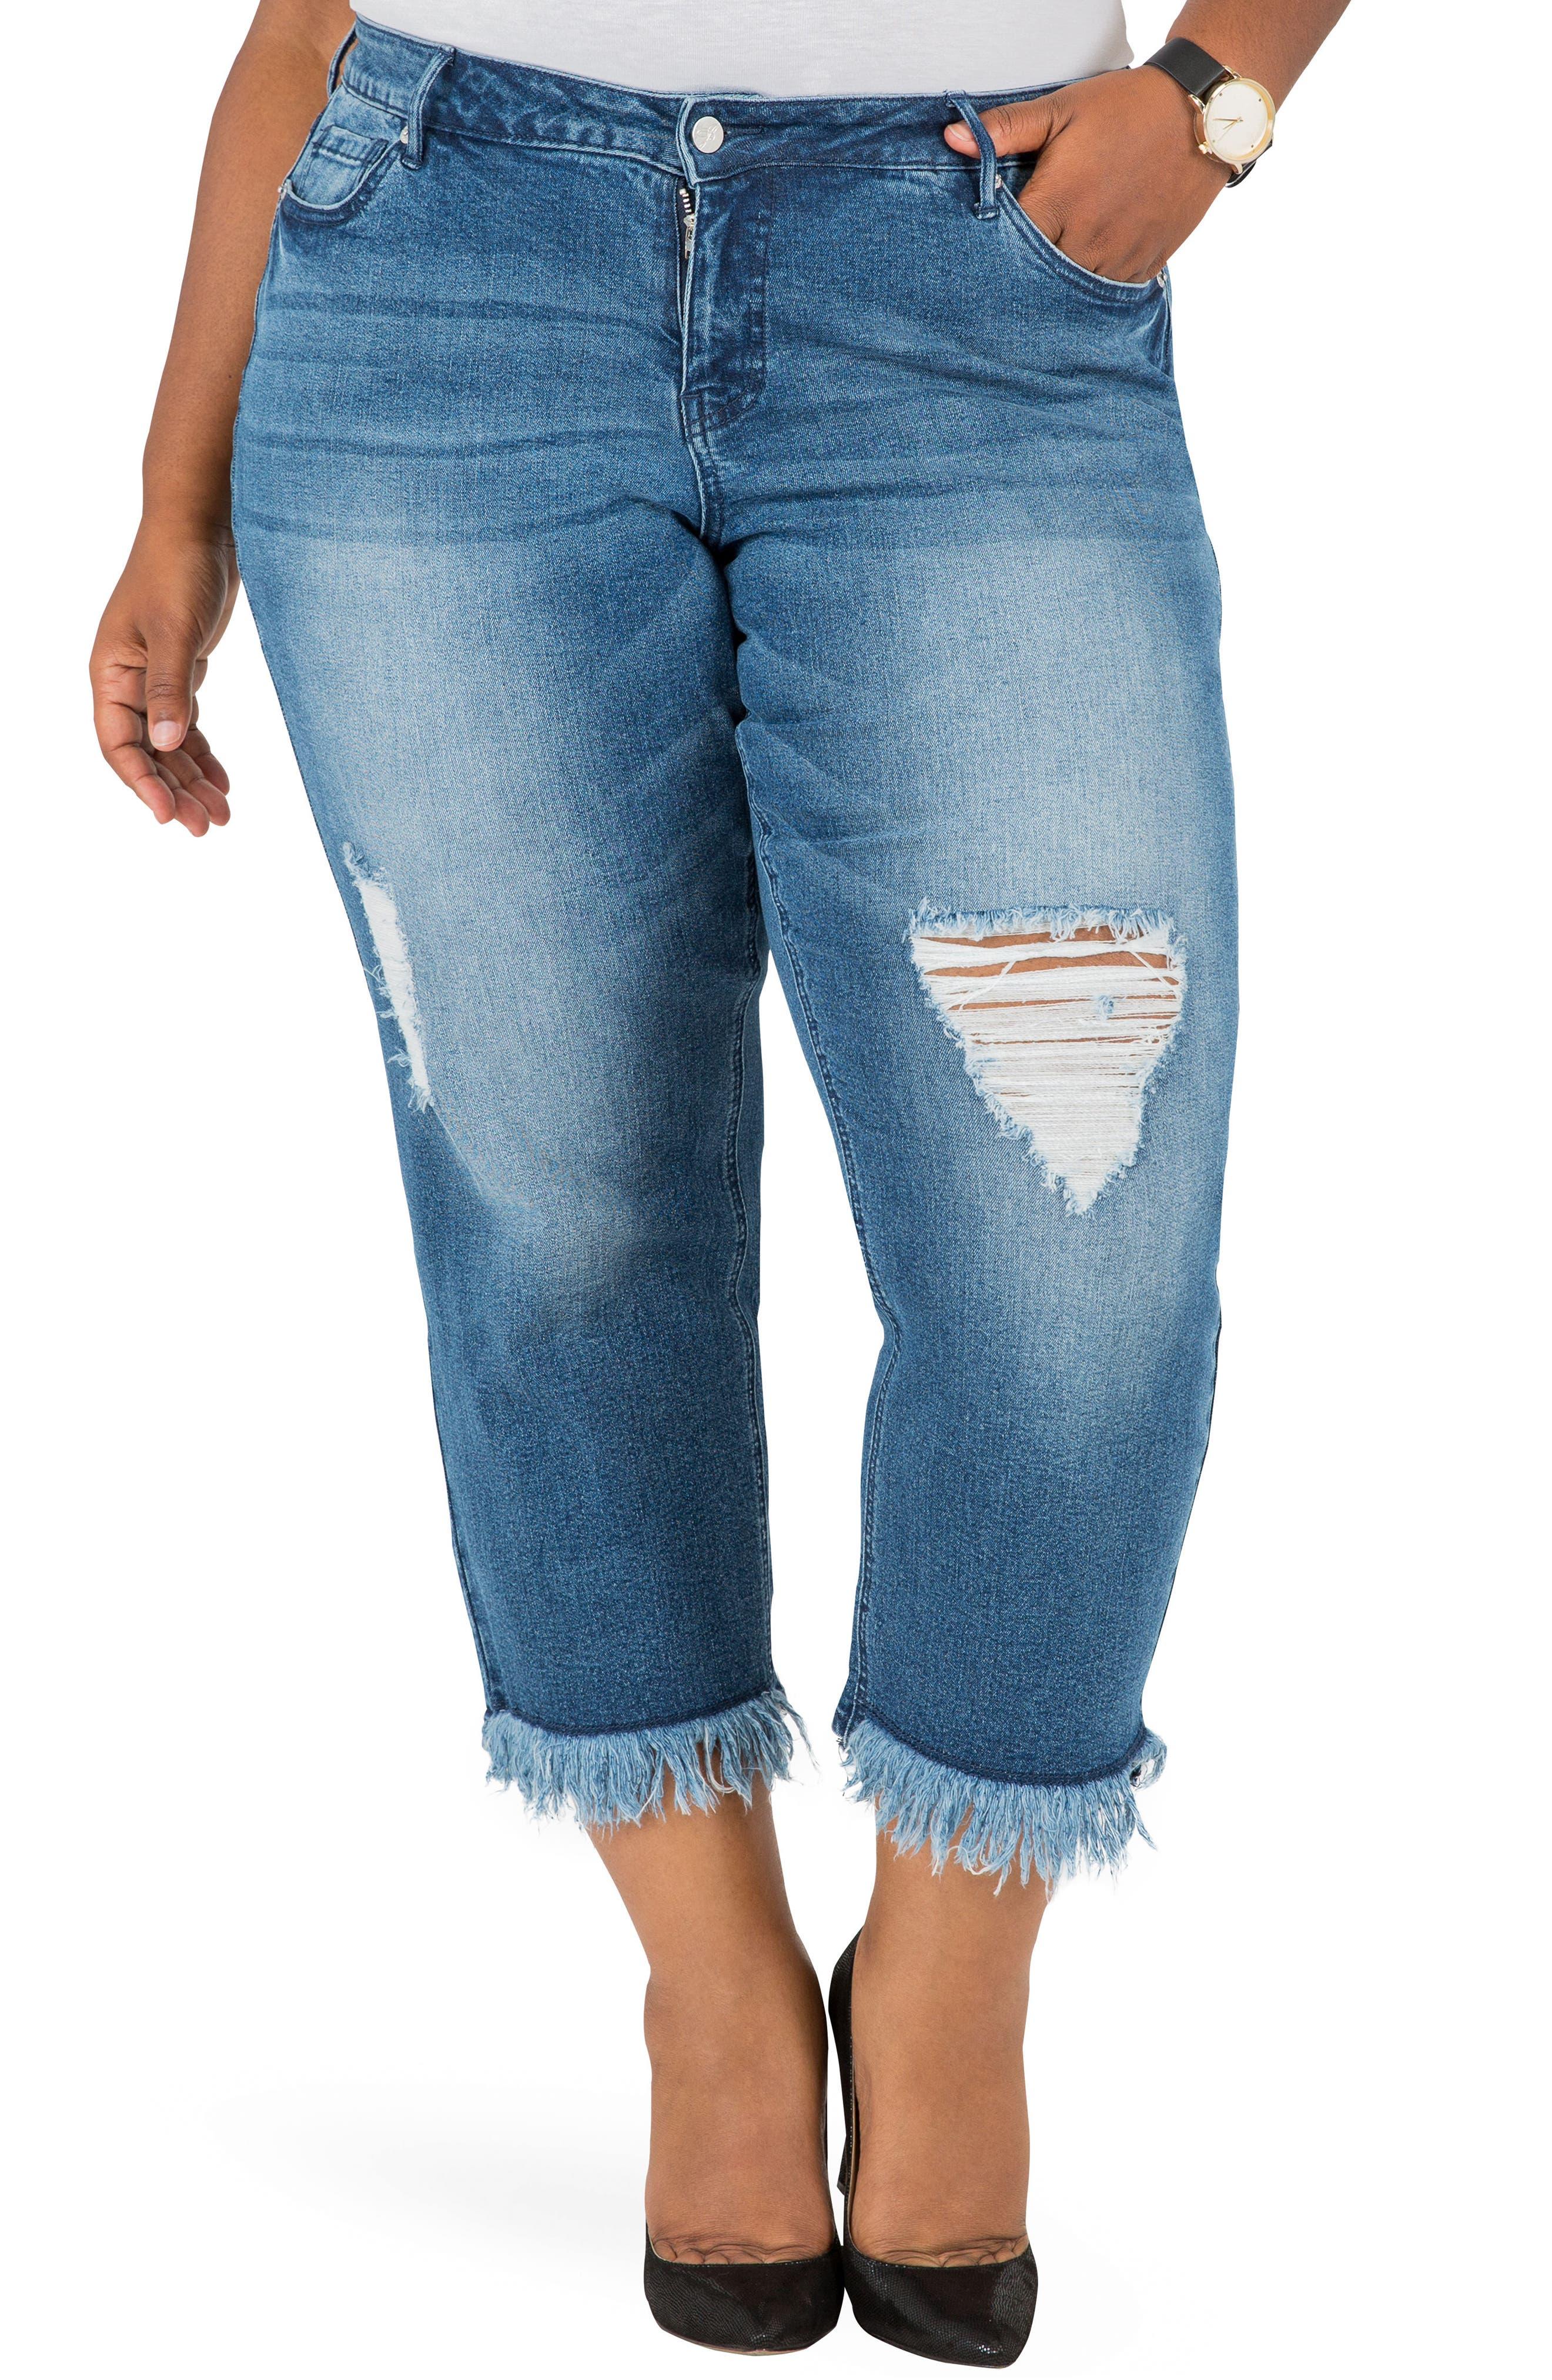 POETIC JUSTICE, Verla Frayed Hem Crop Boyfriend Jeans, Main thumbnail 1, color, LIGHT BLUE